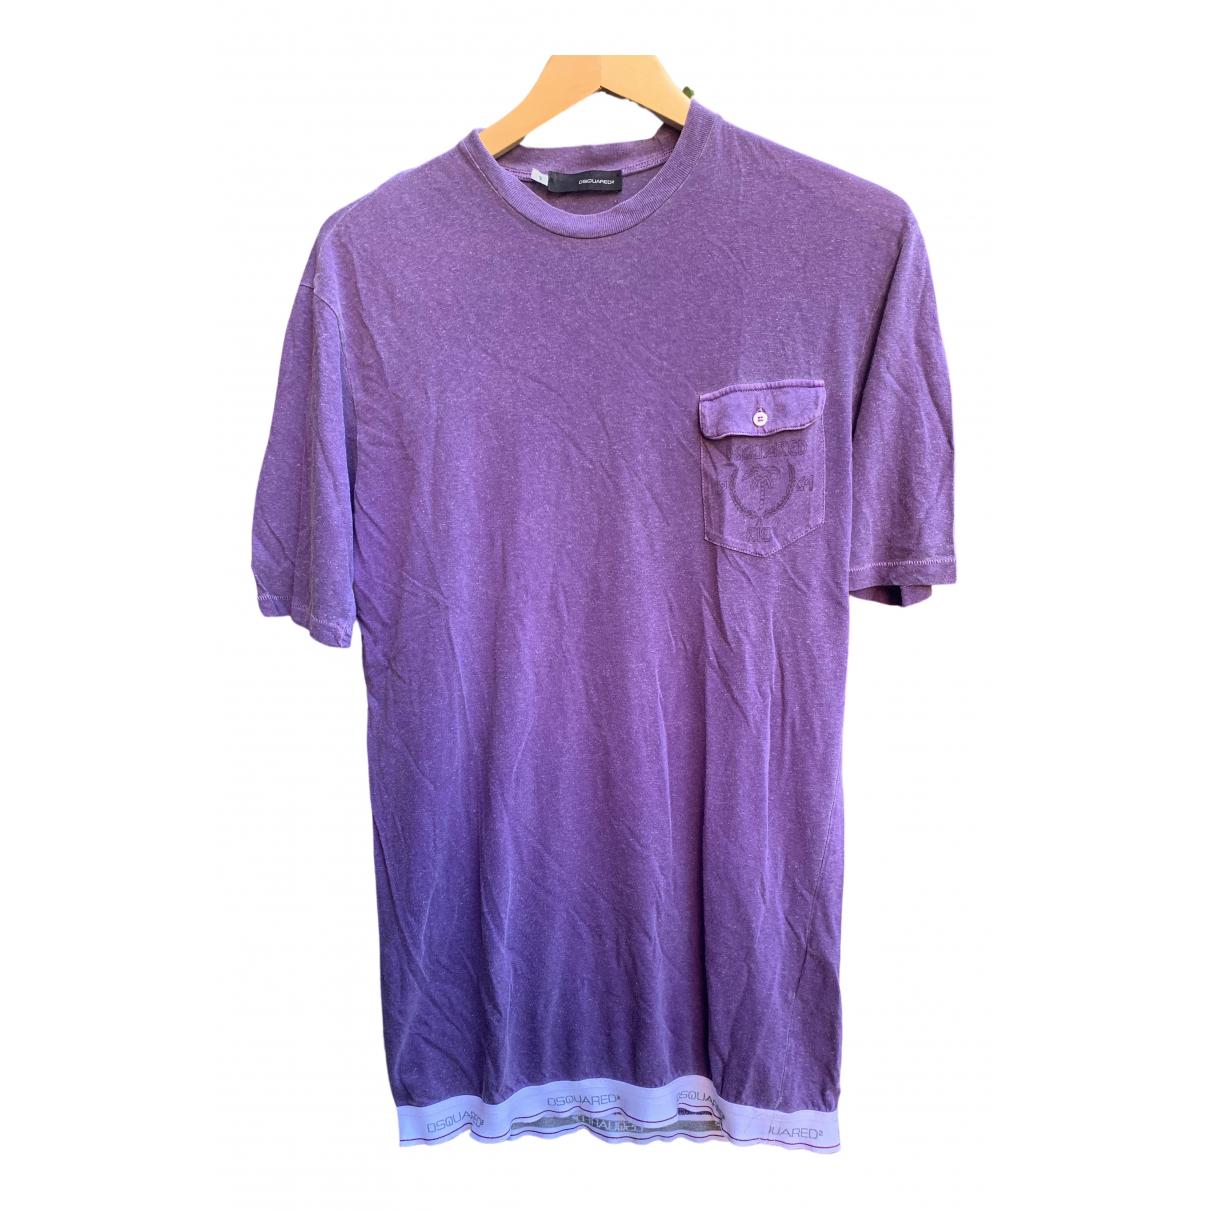 Dsquared2 \N Purple Cotton T-shirts for Men S International